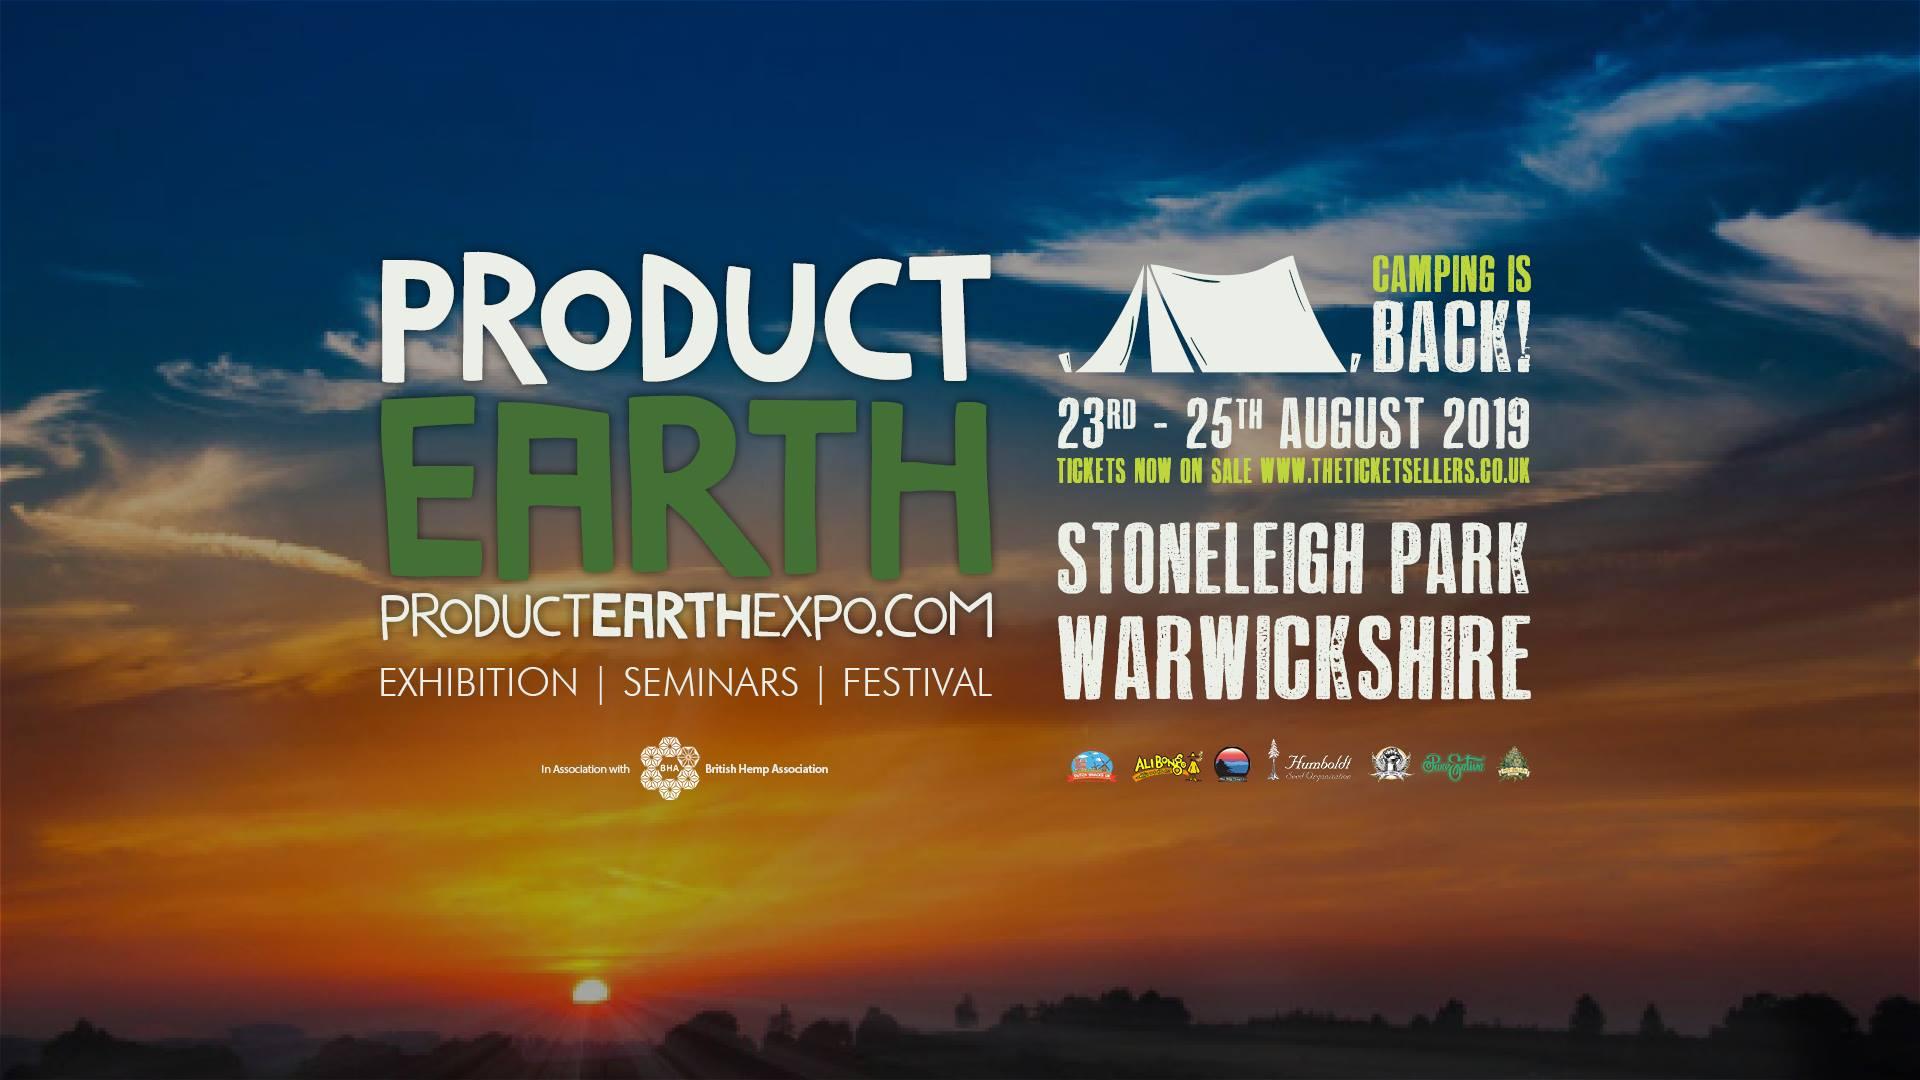 Product Earth Expo & Festival 2019